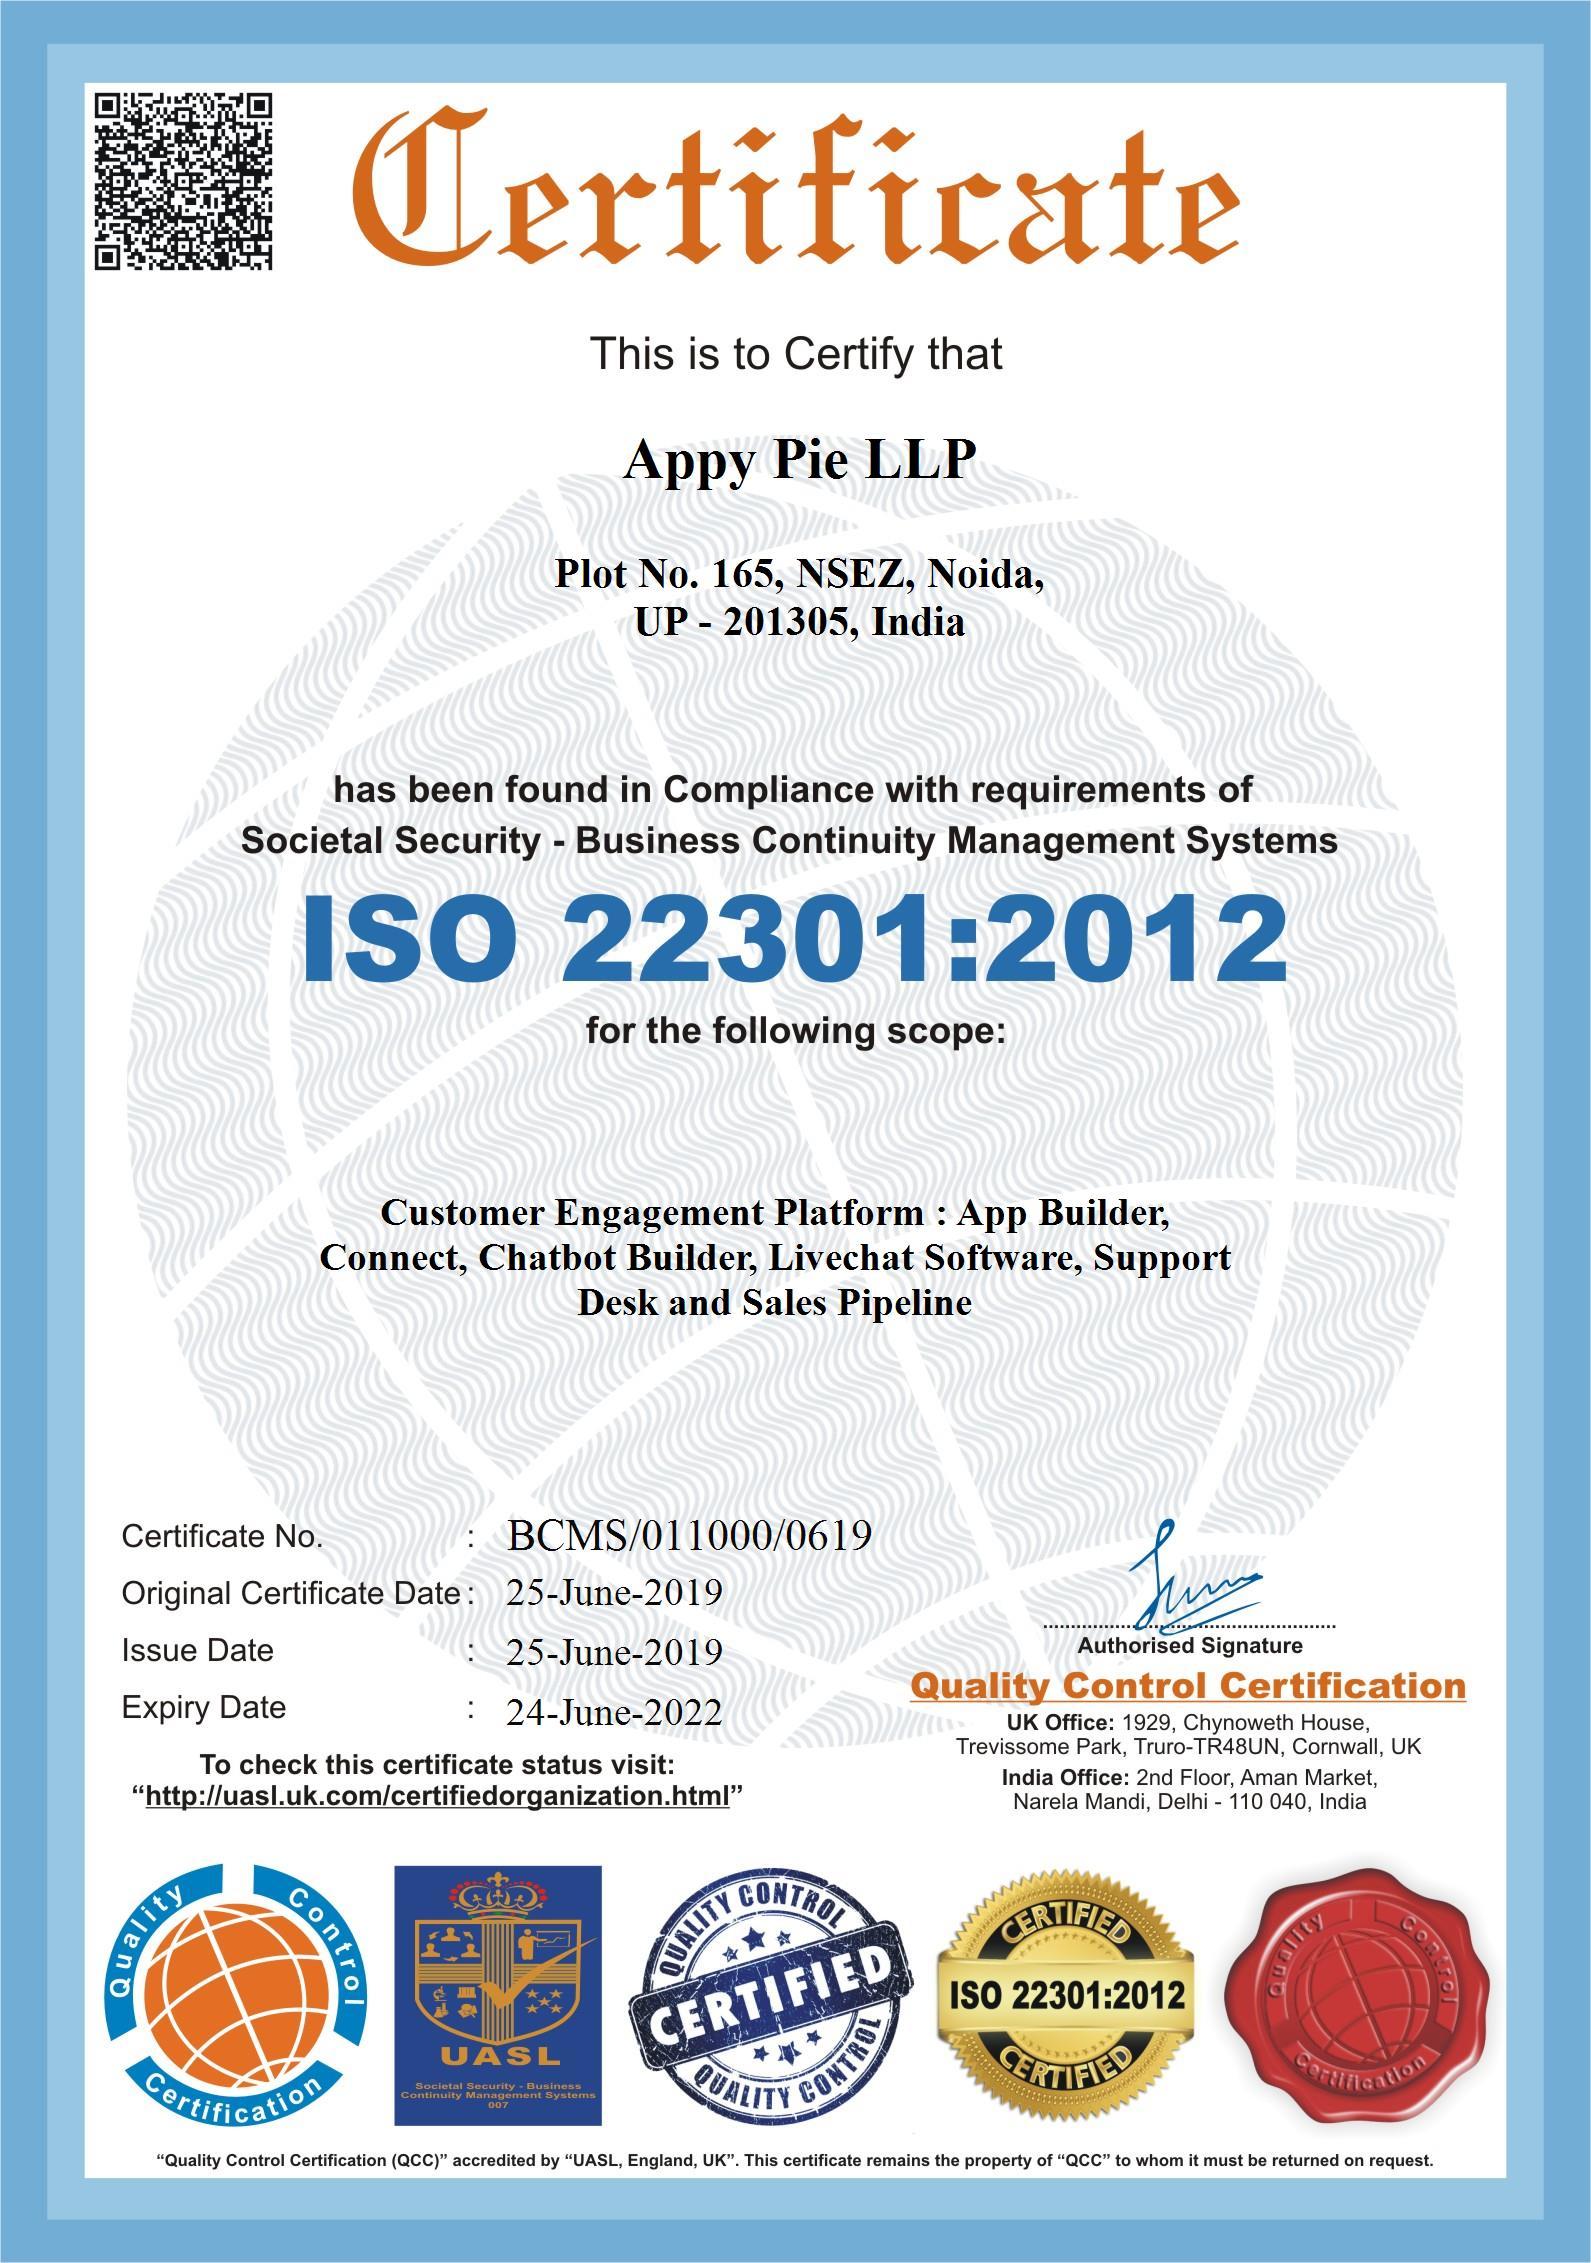 Appy Pie LLP